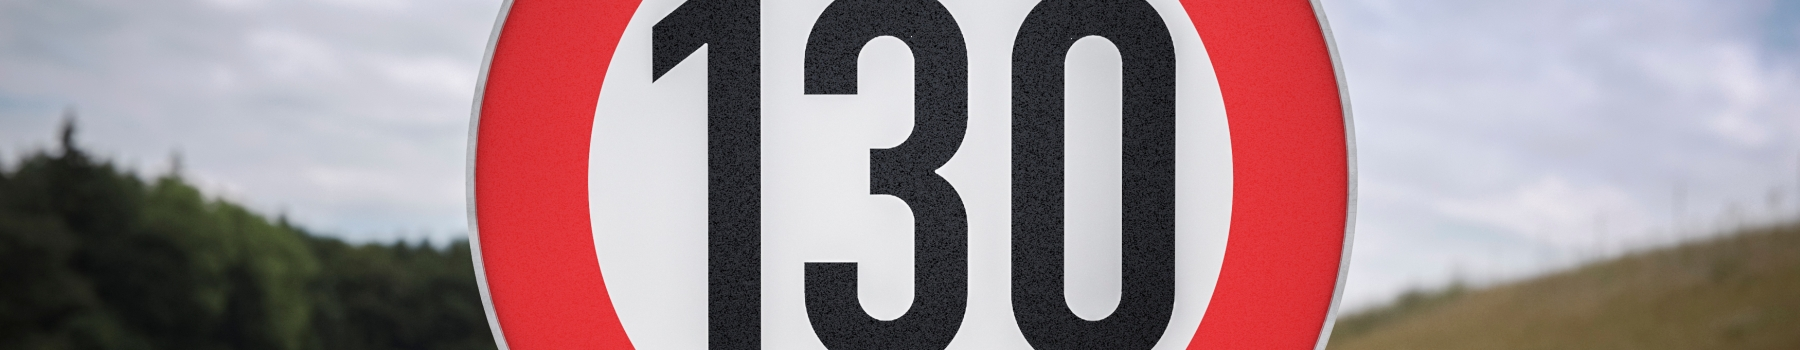 Tempolimit 350